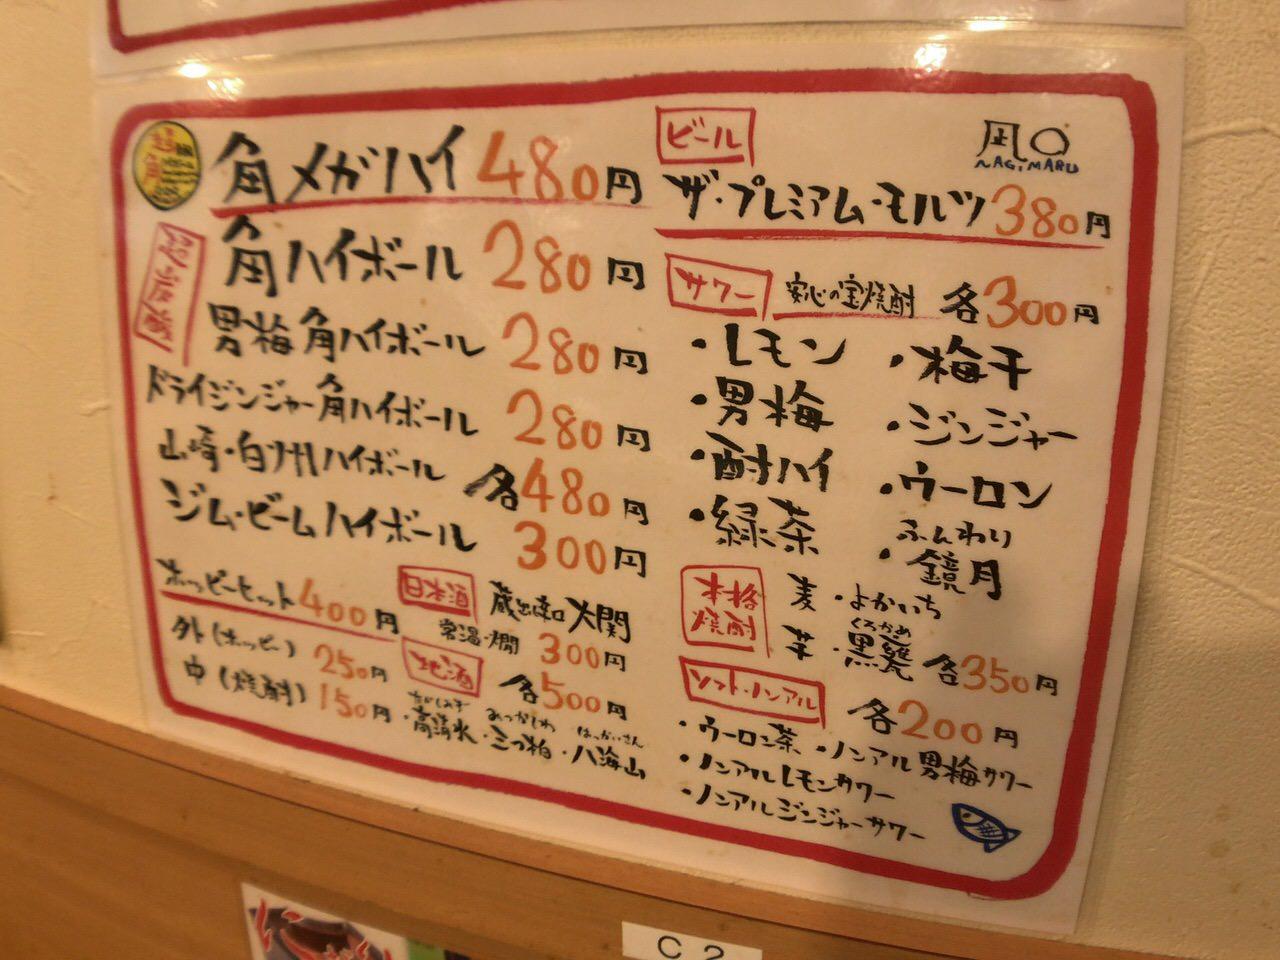 Nagimaru IMG 3335